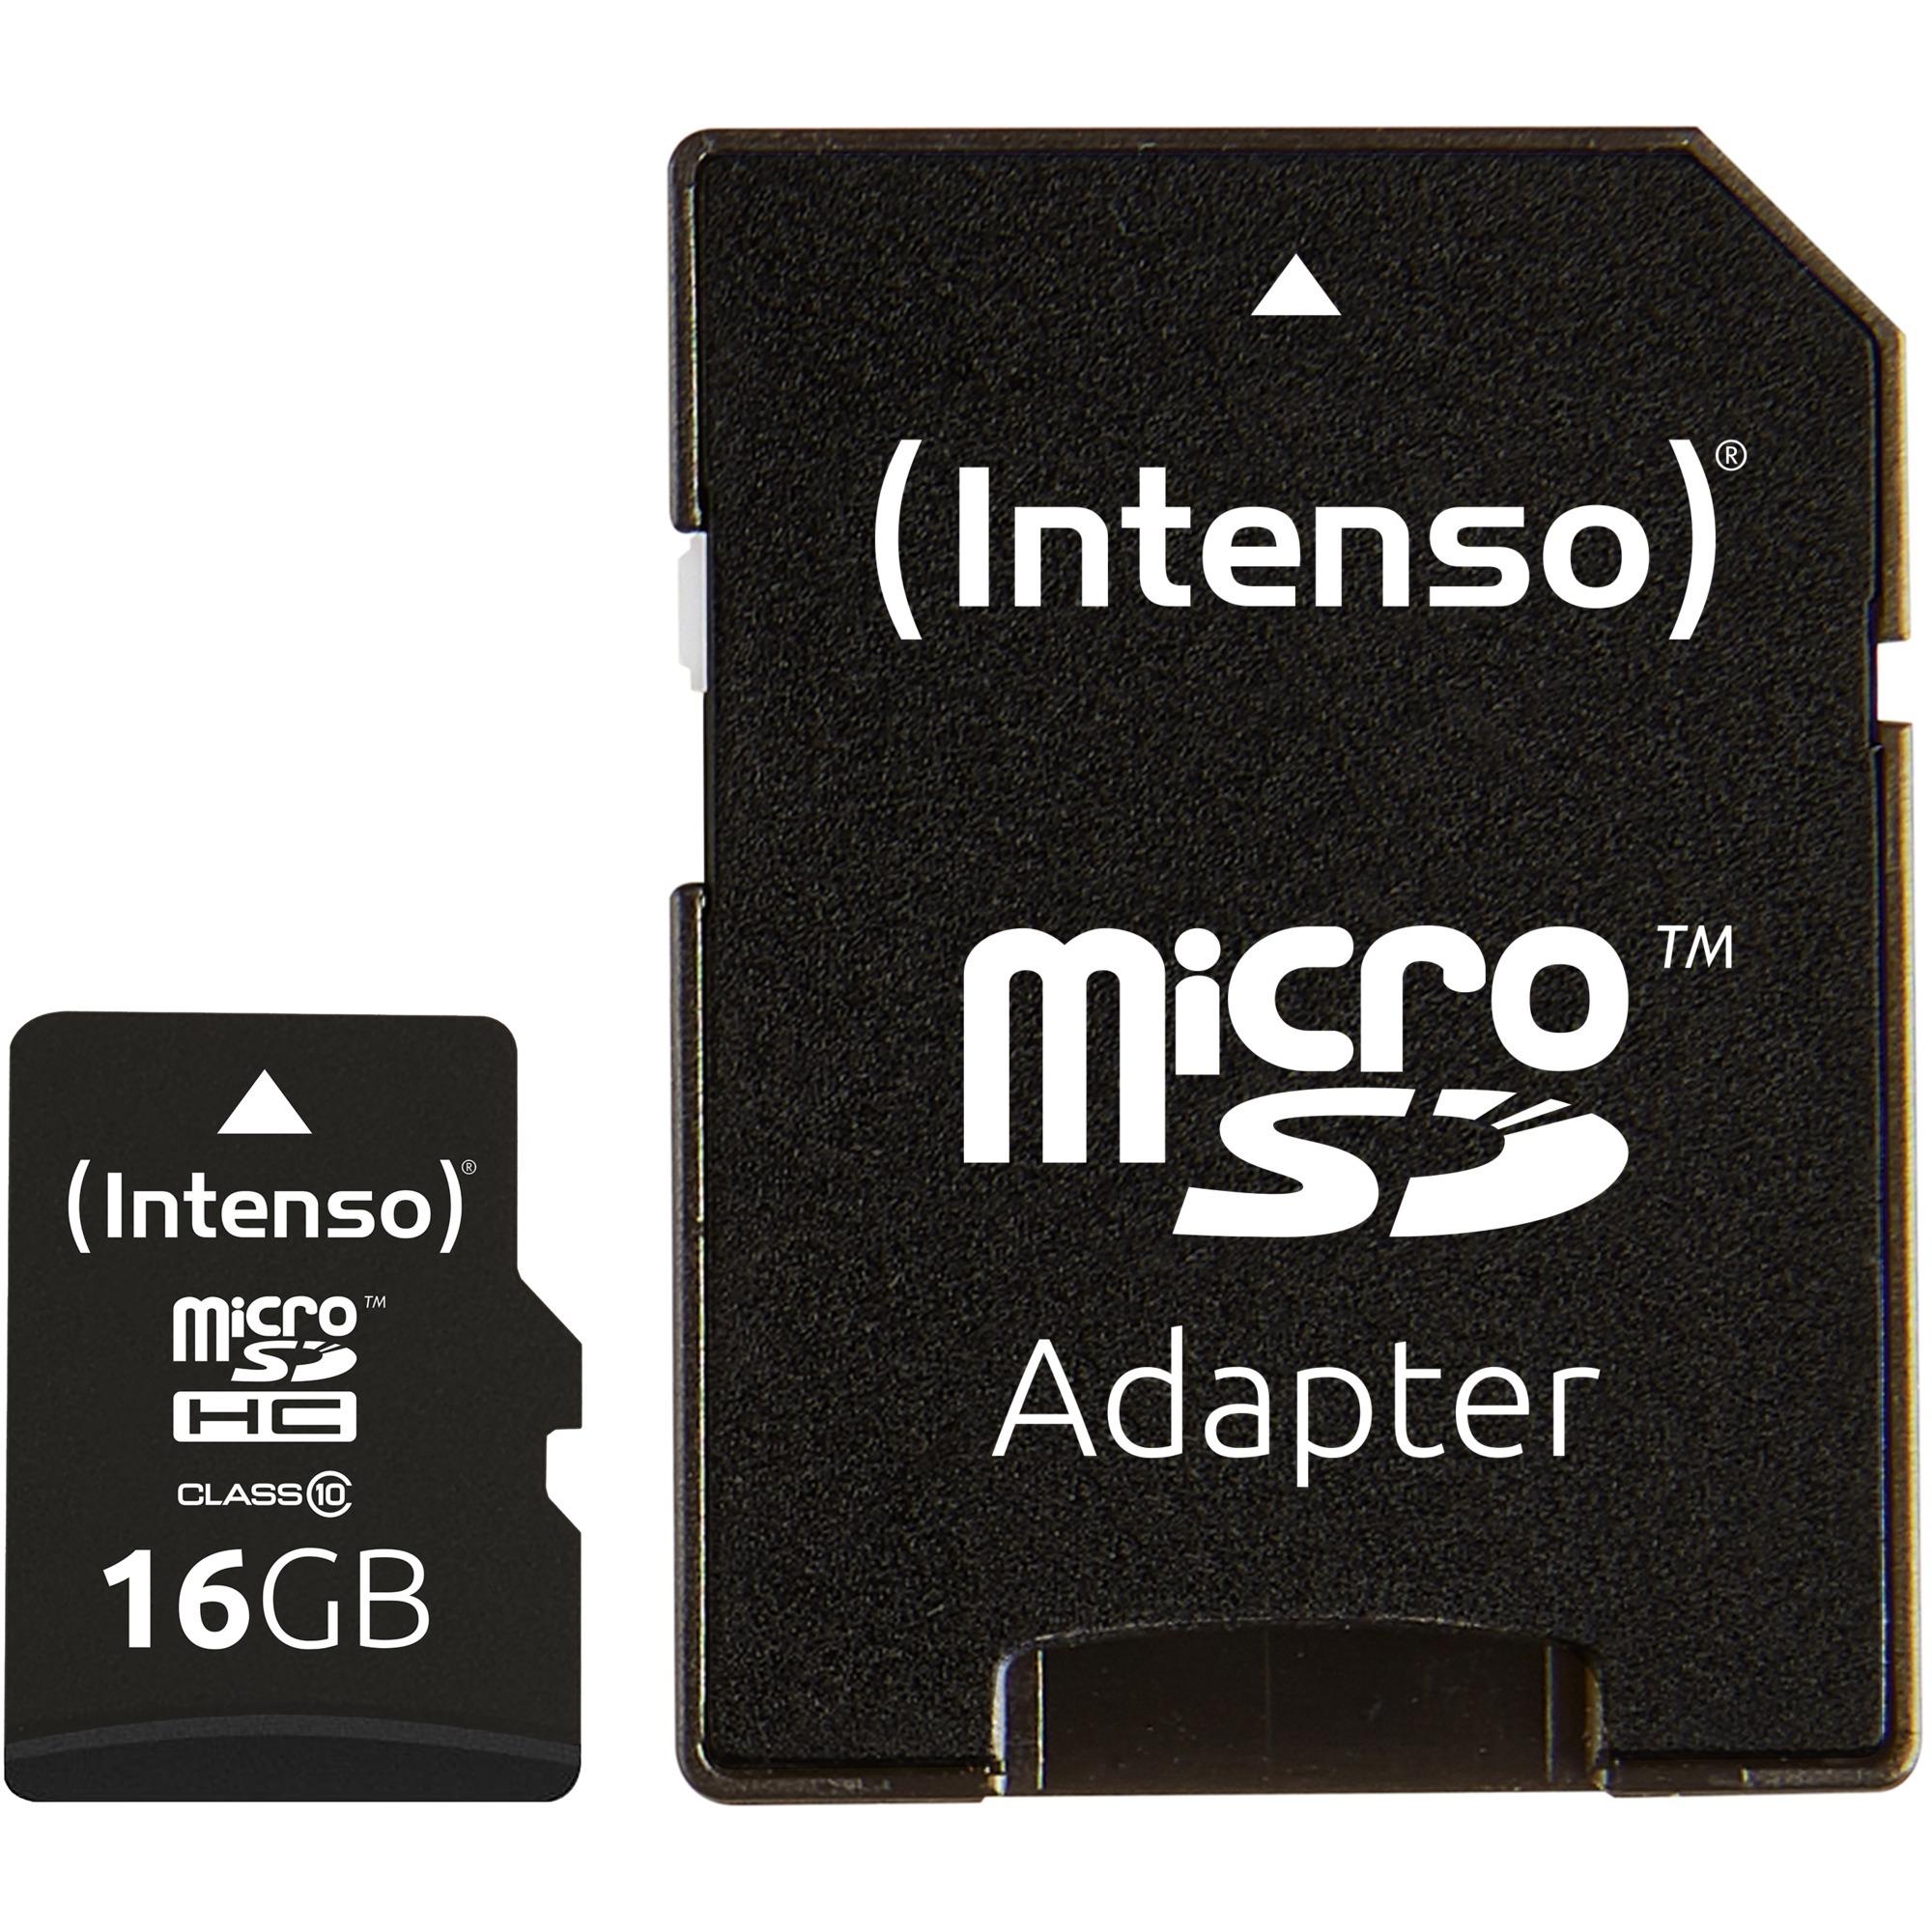 16GB MicroSDHC memoria flash Clase 10, Tarjeta de memoria